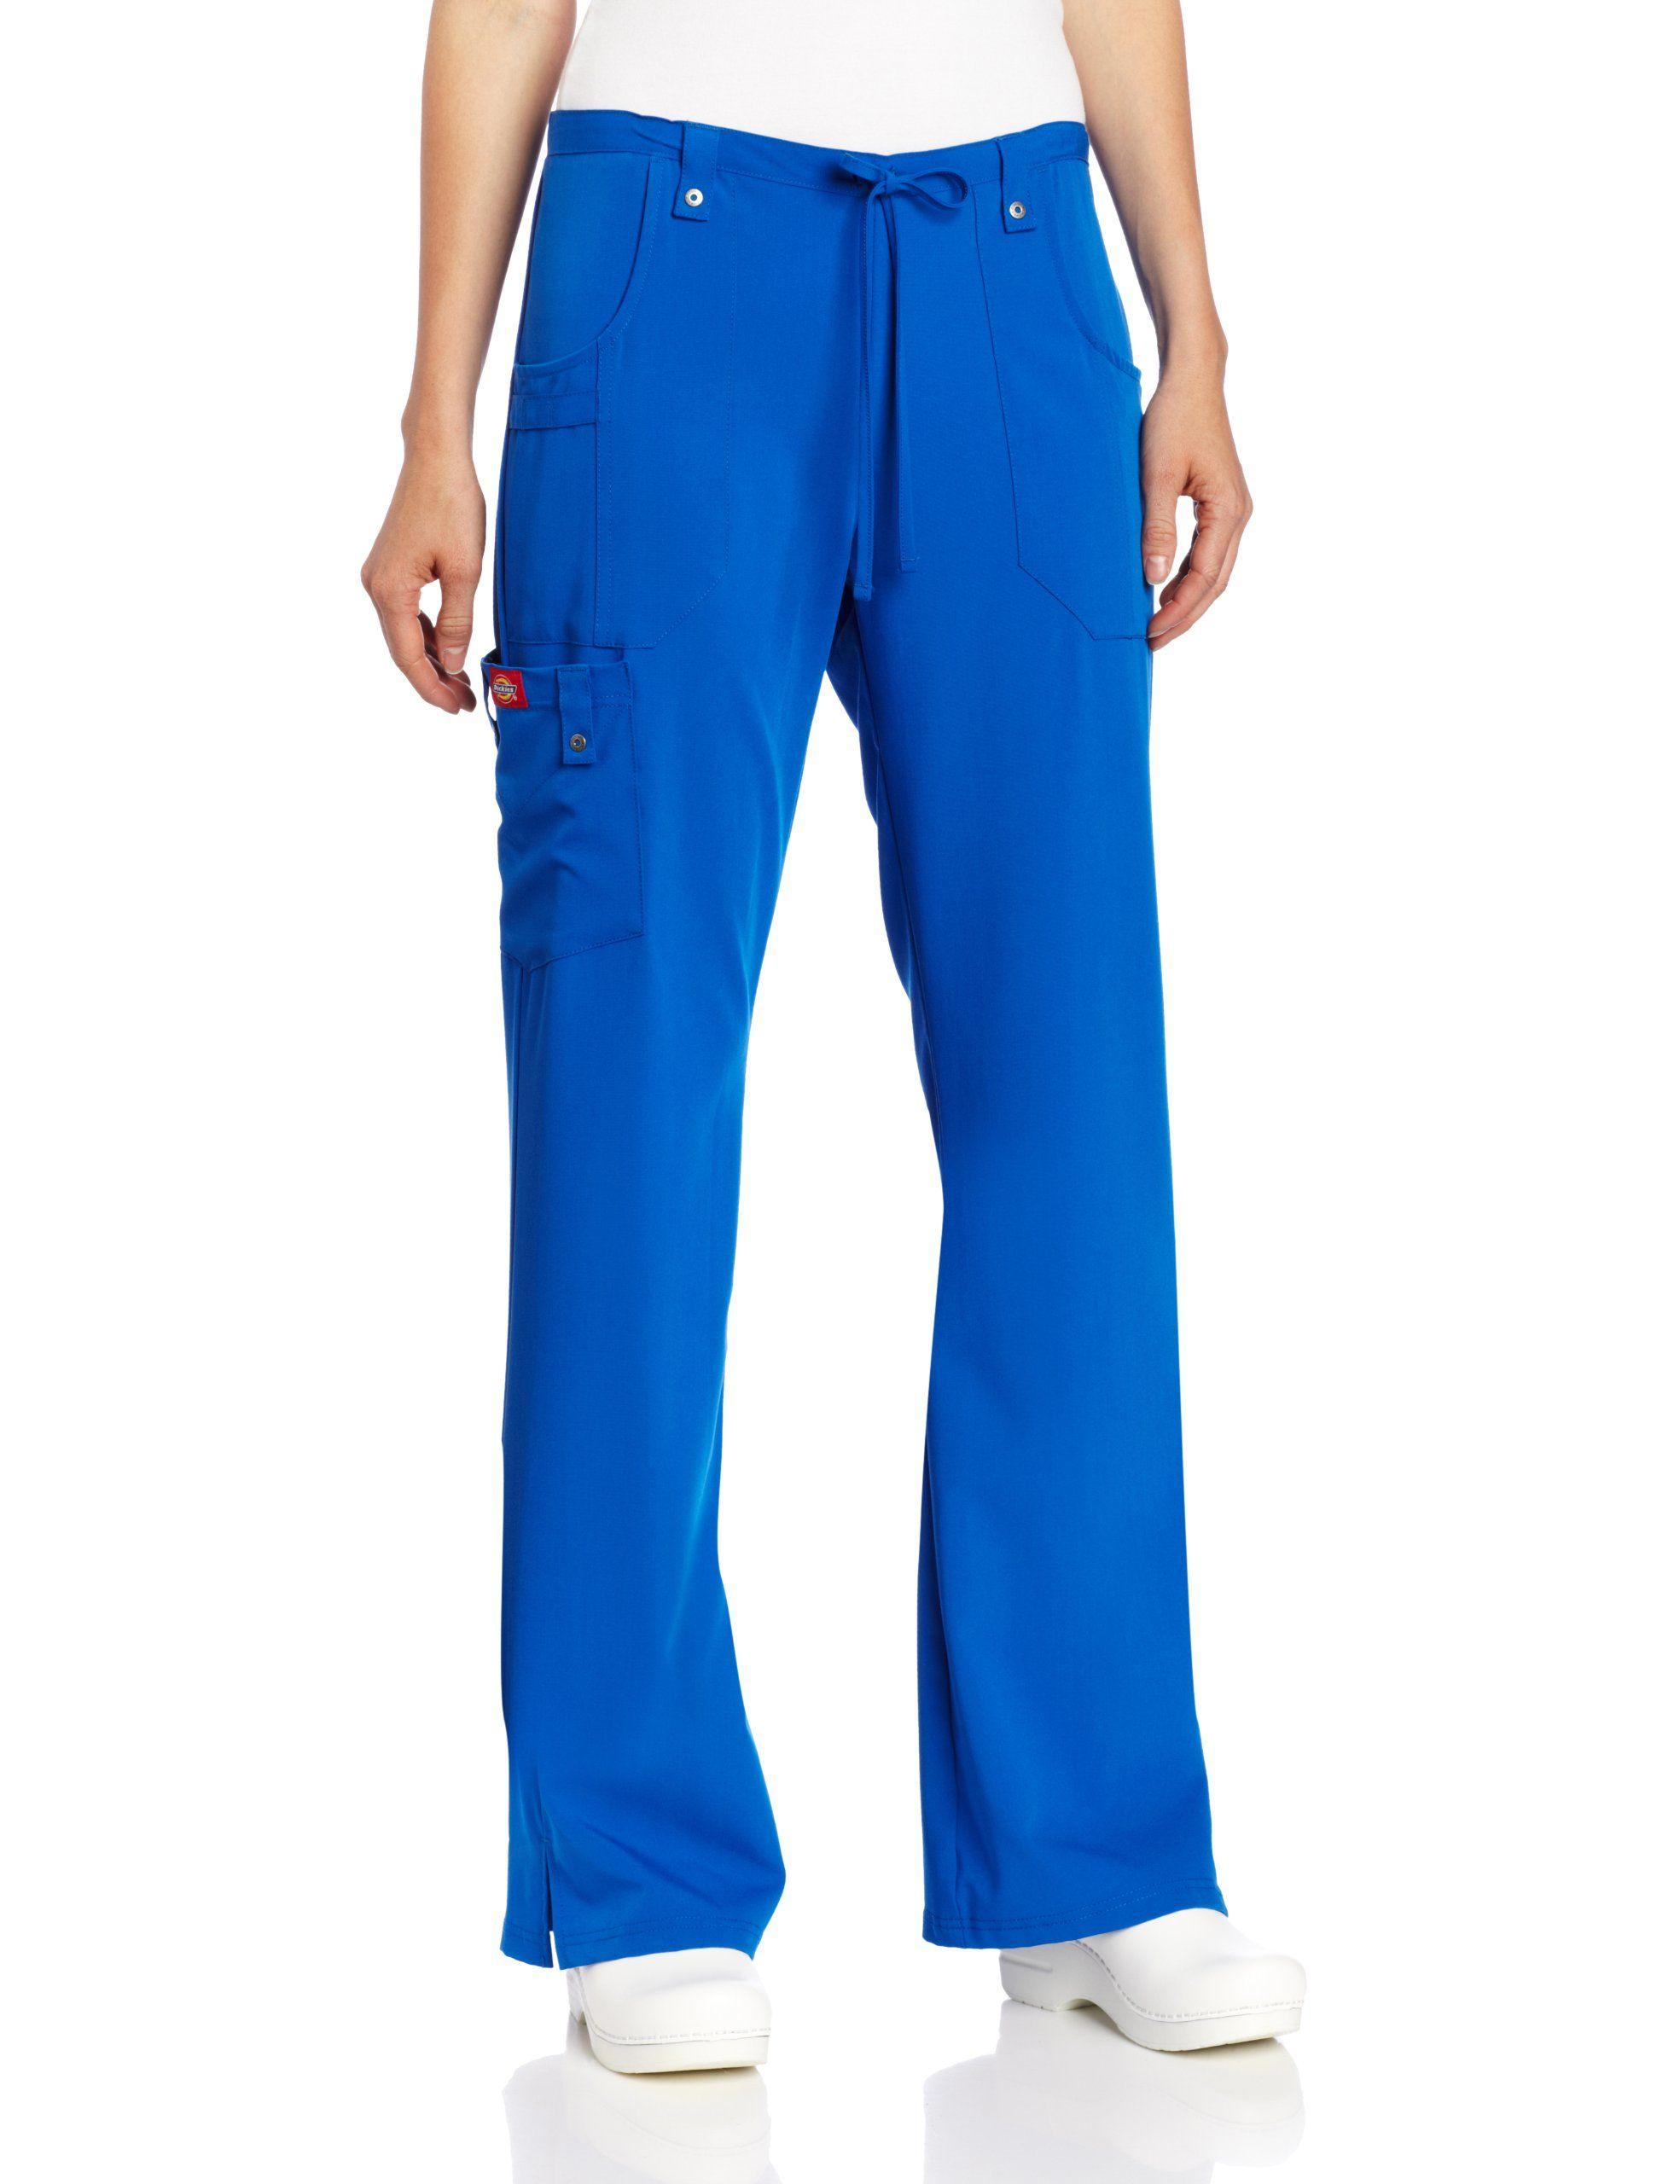 699e6735f28 Amazon.com  Dickies Scrubs Women s Xtreme Stretch-Fit Drawstring Flare-Leg  Pant  Medical Scrubs Pants  Clothing